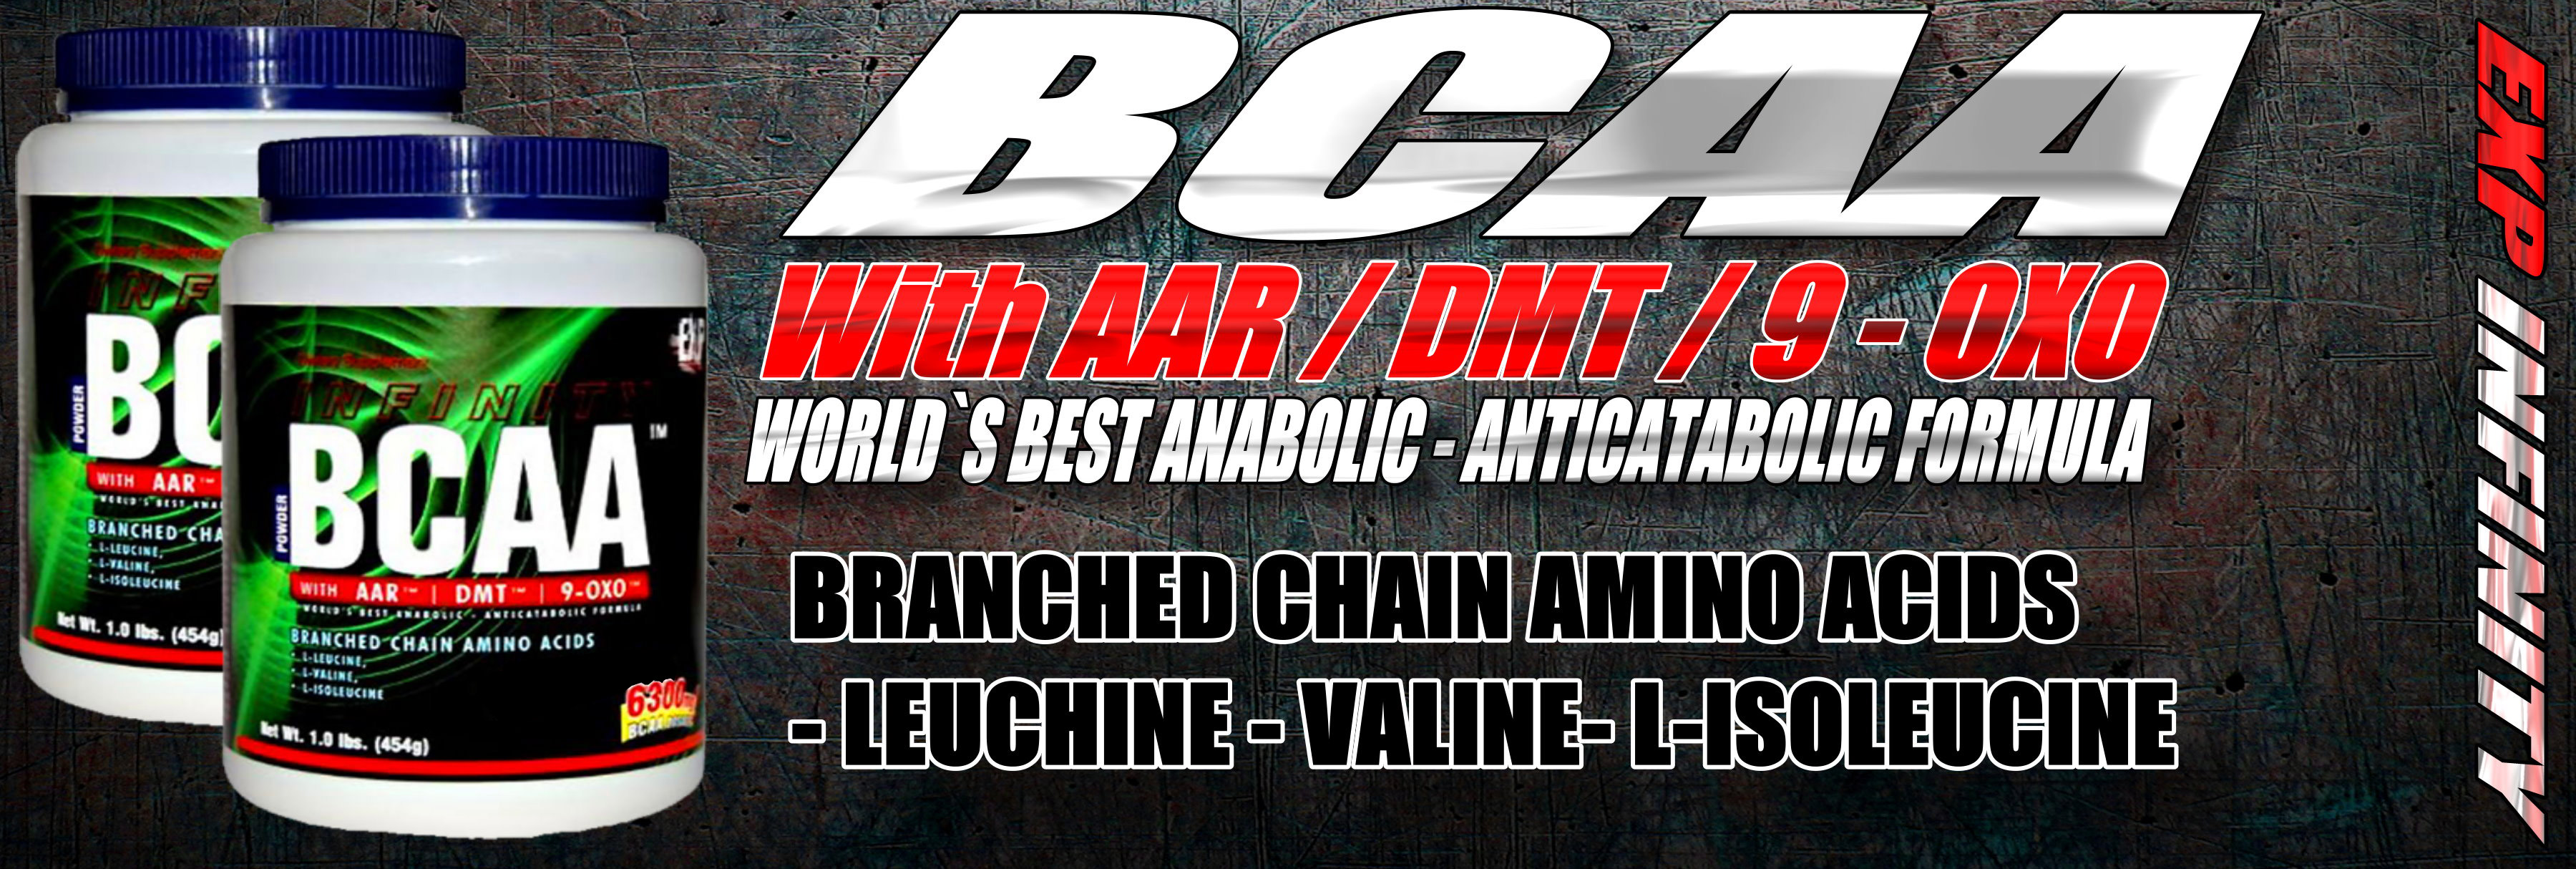 http://www.bull-attack.com/images/exp-bcaa-banner.jpg